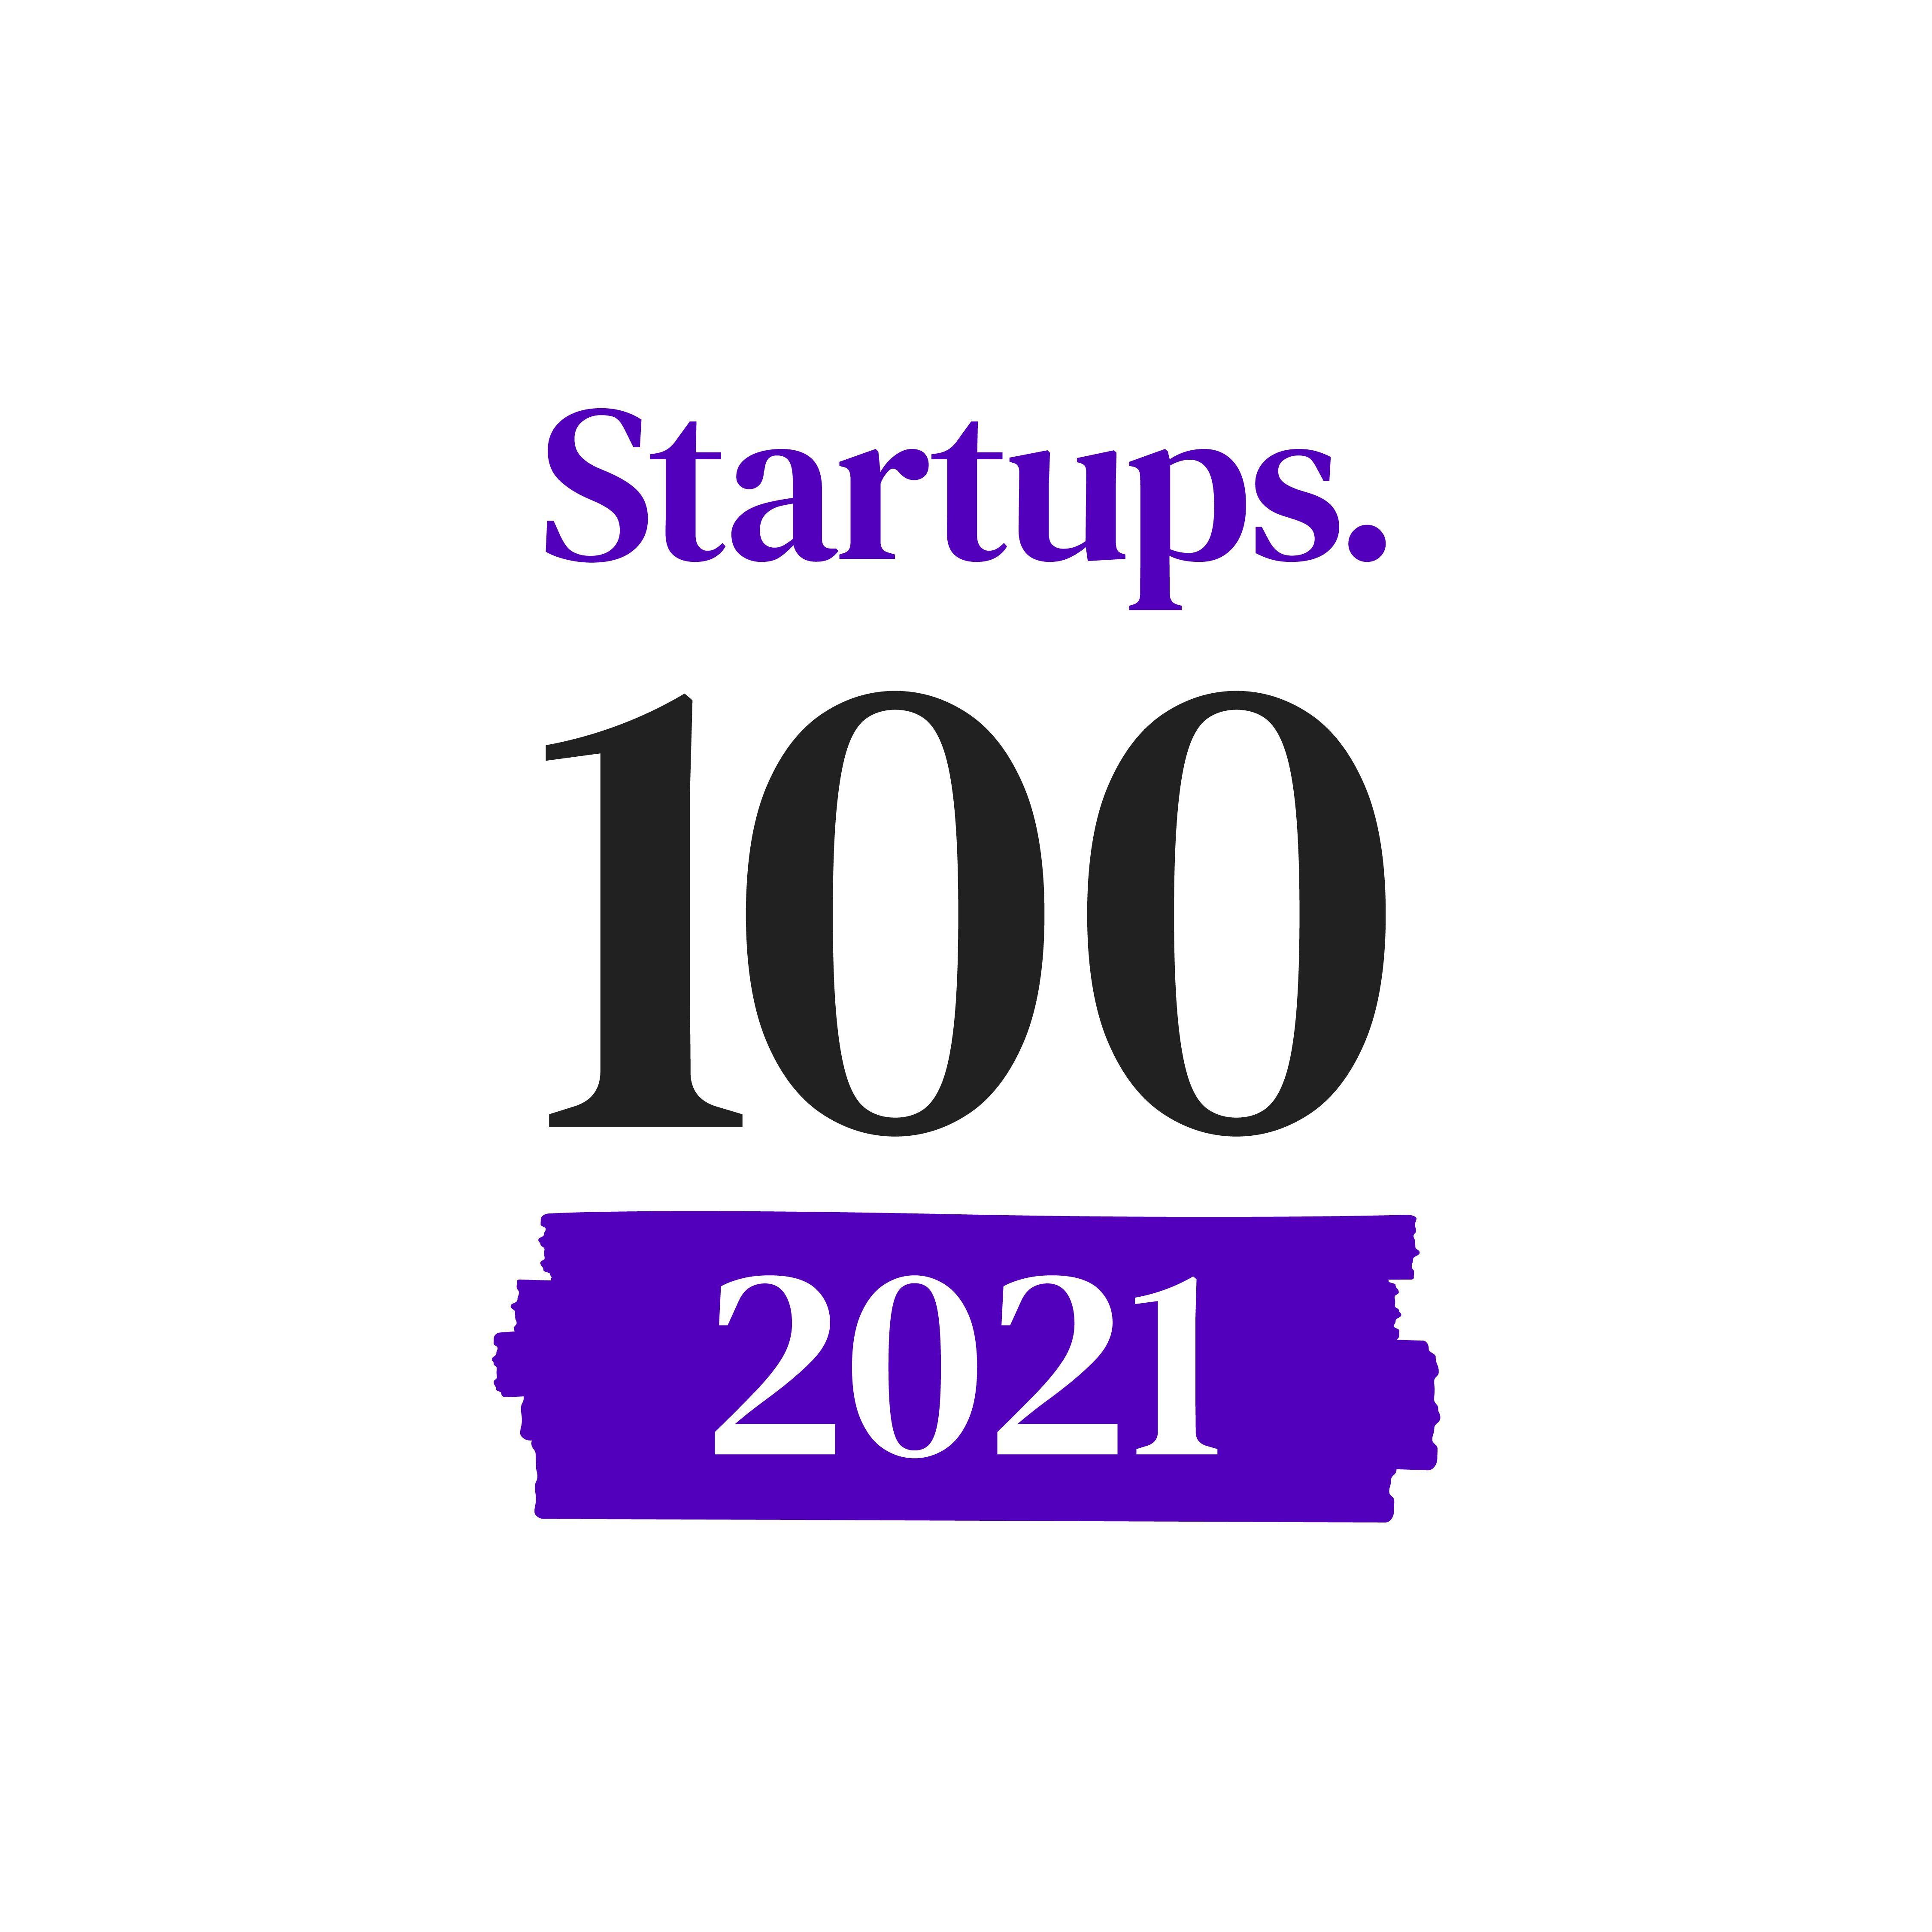 Startups 100 2021 logo